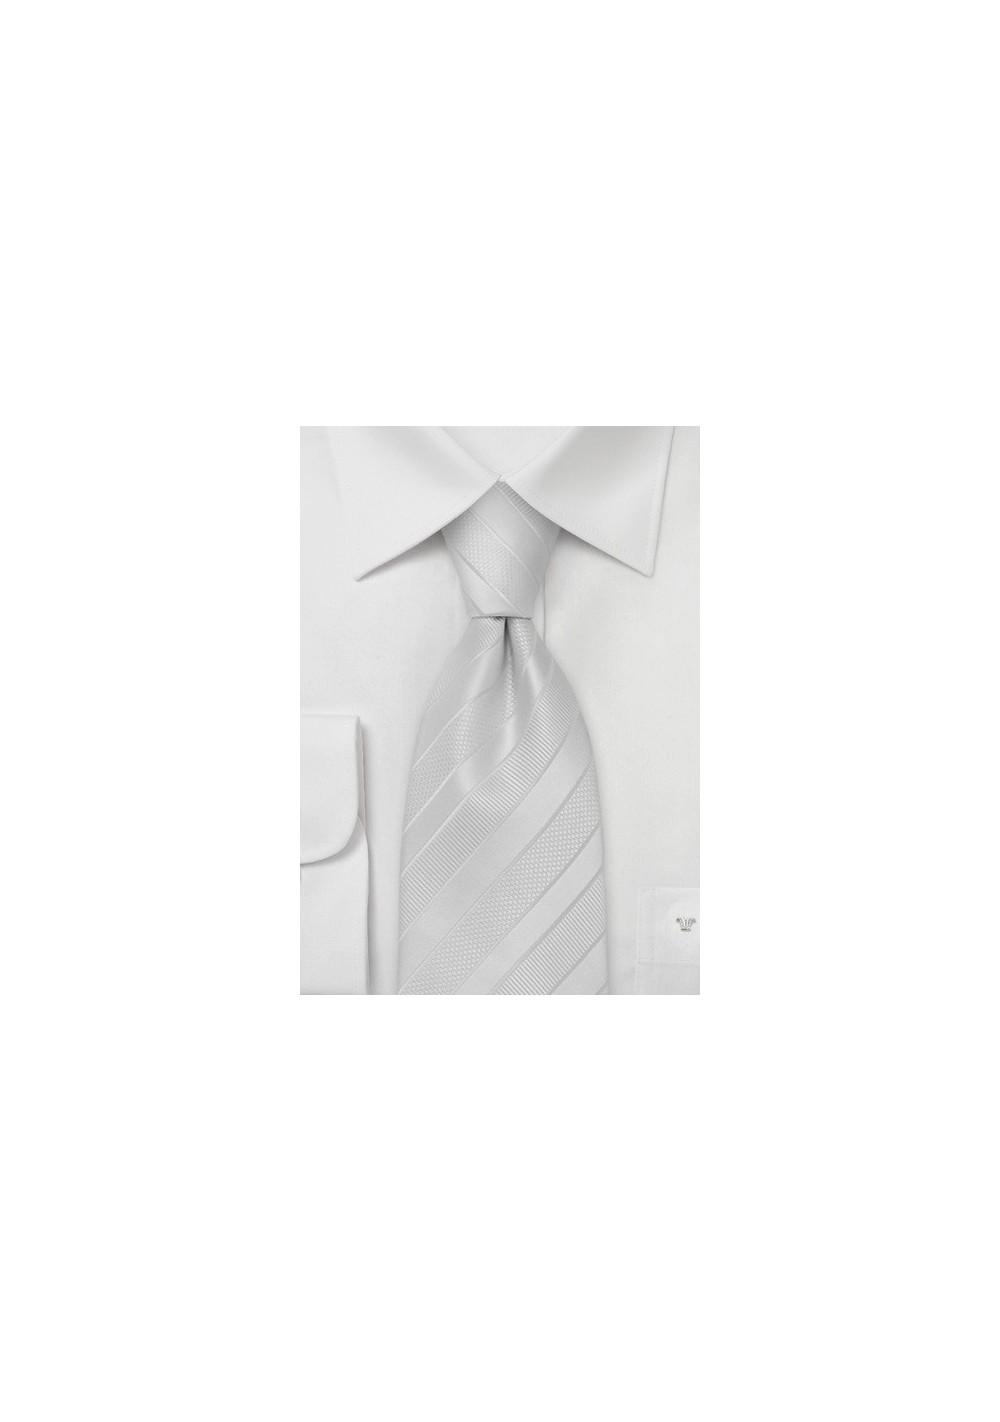 Elegant and Formal Ivory Necktie